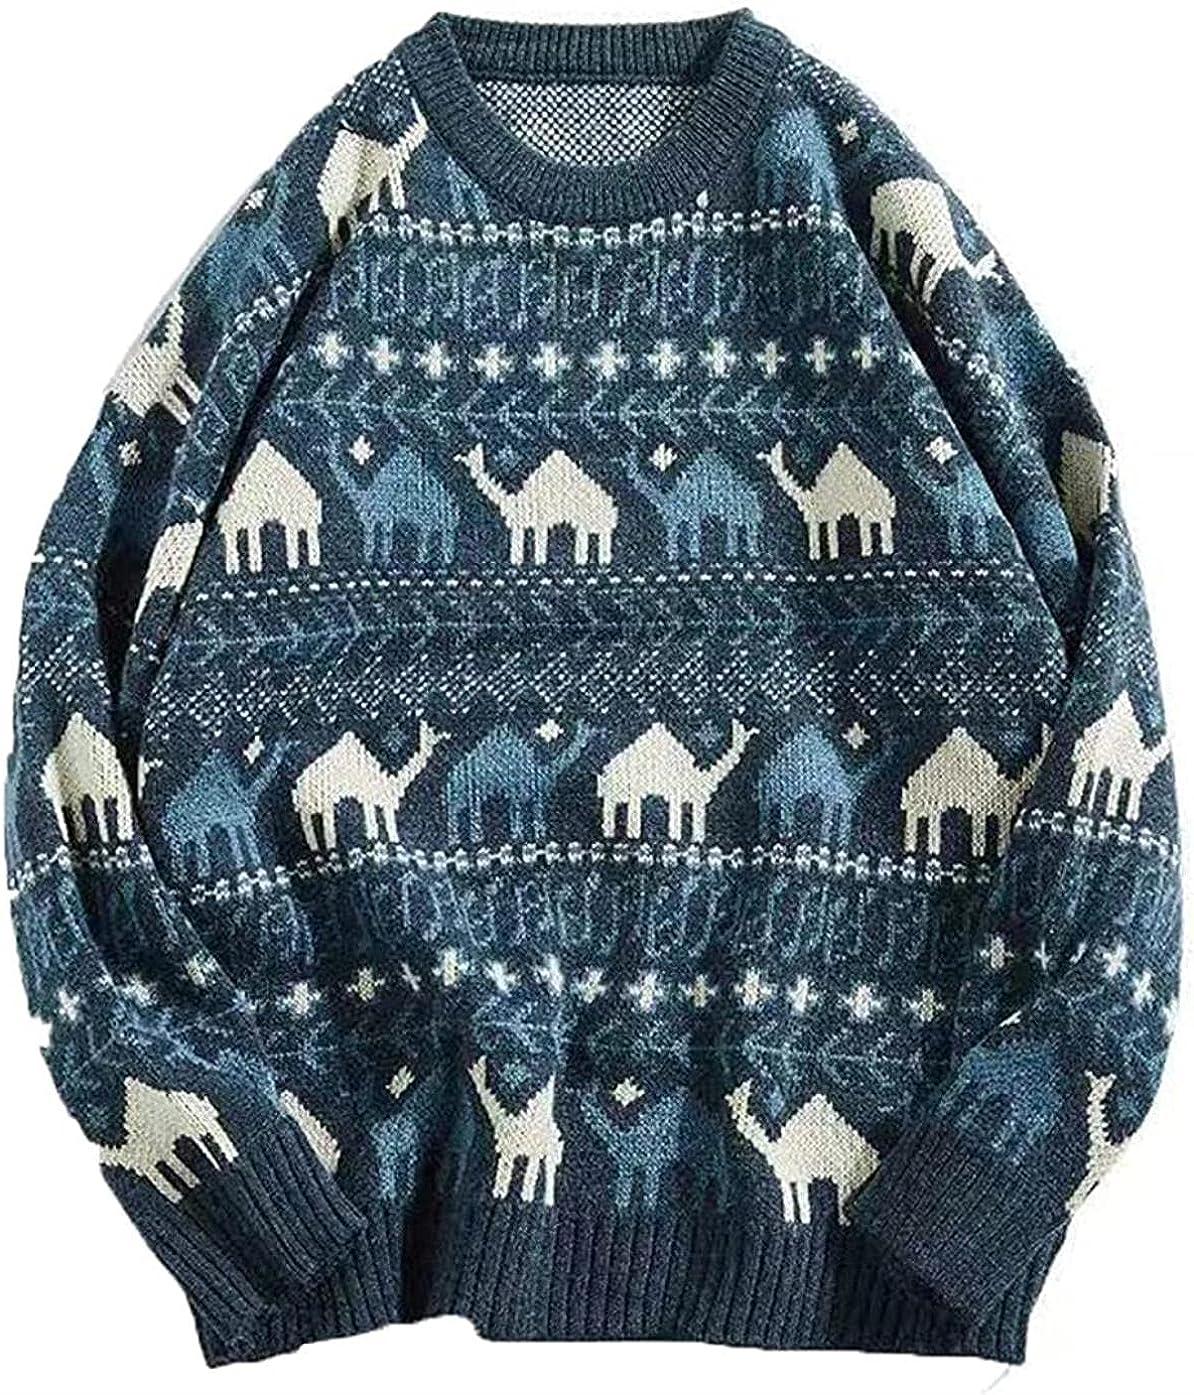 JOAOL Men Sweater Autumn Winter Retro Print Pullover Sweater Casual Loose Soft Sweater